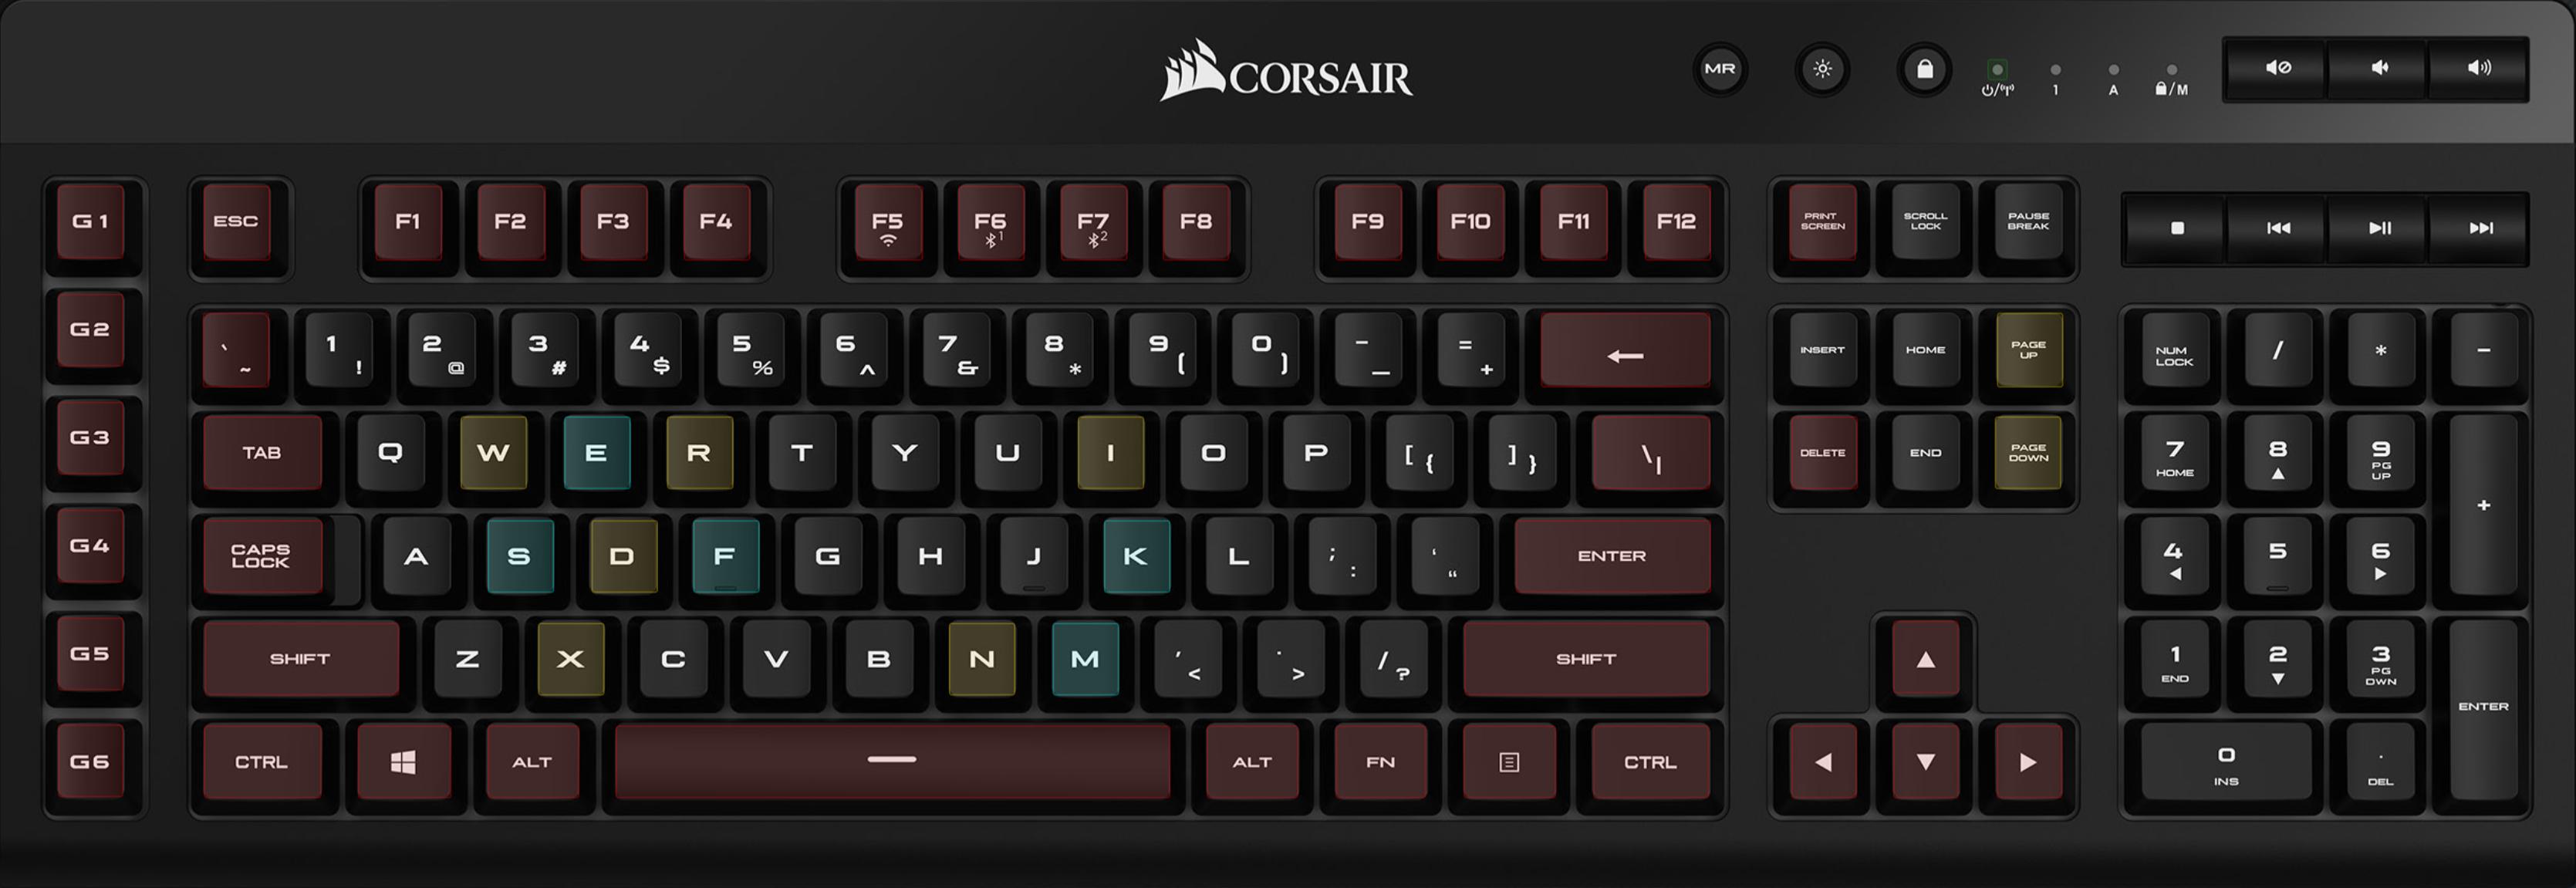 computer keyboard diagram rgb keyboard key map color per key diagram template the corsair  rgb keyboard key map color per key